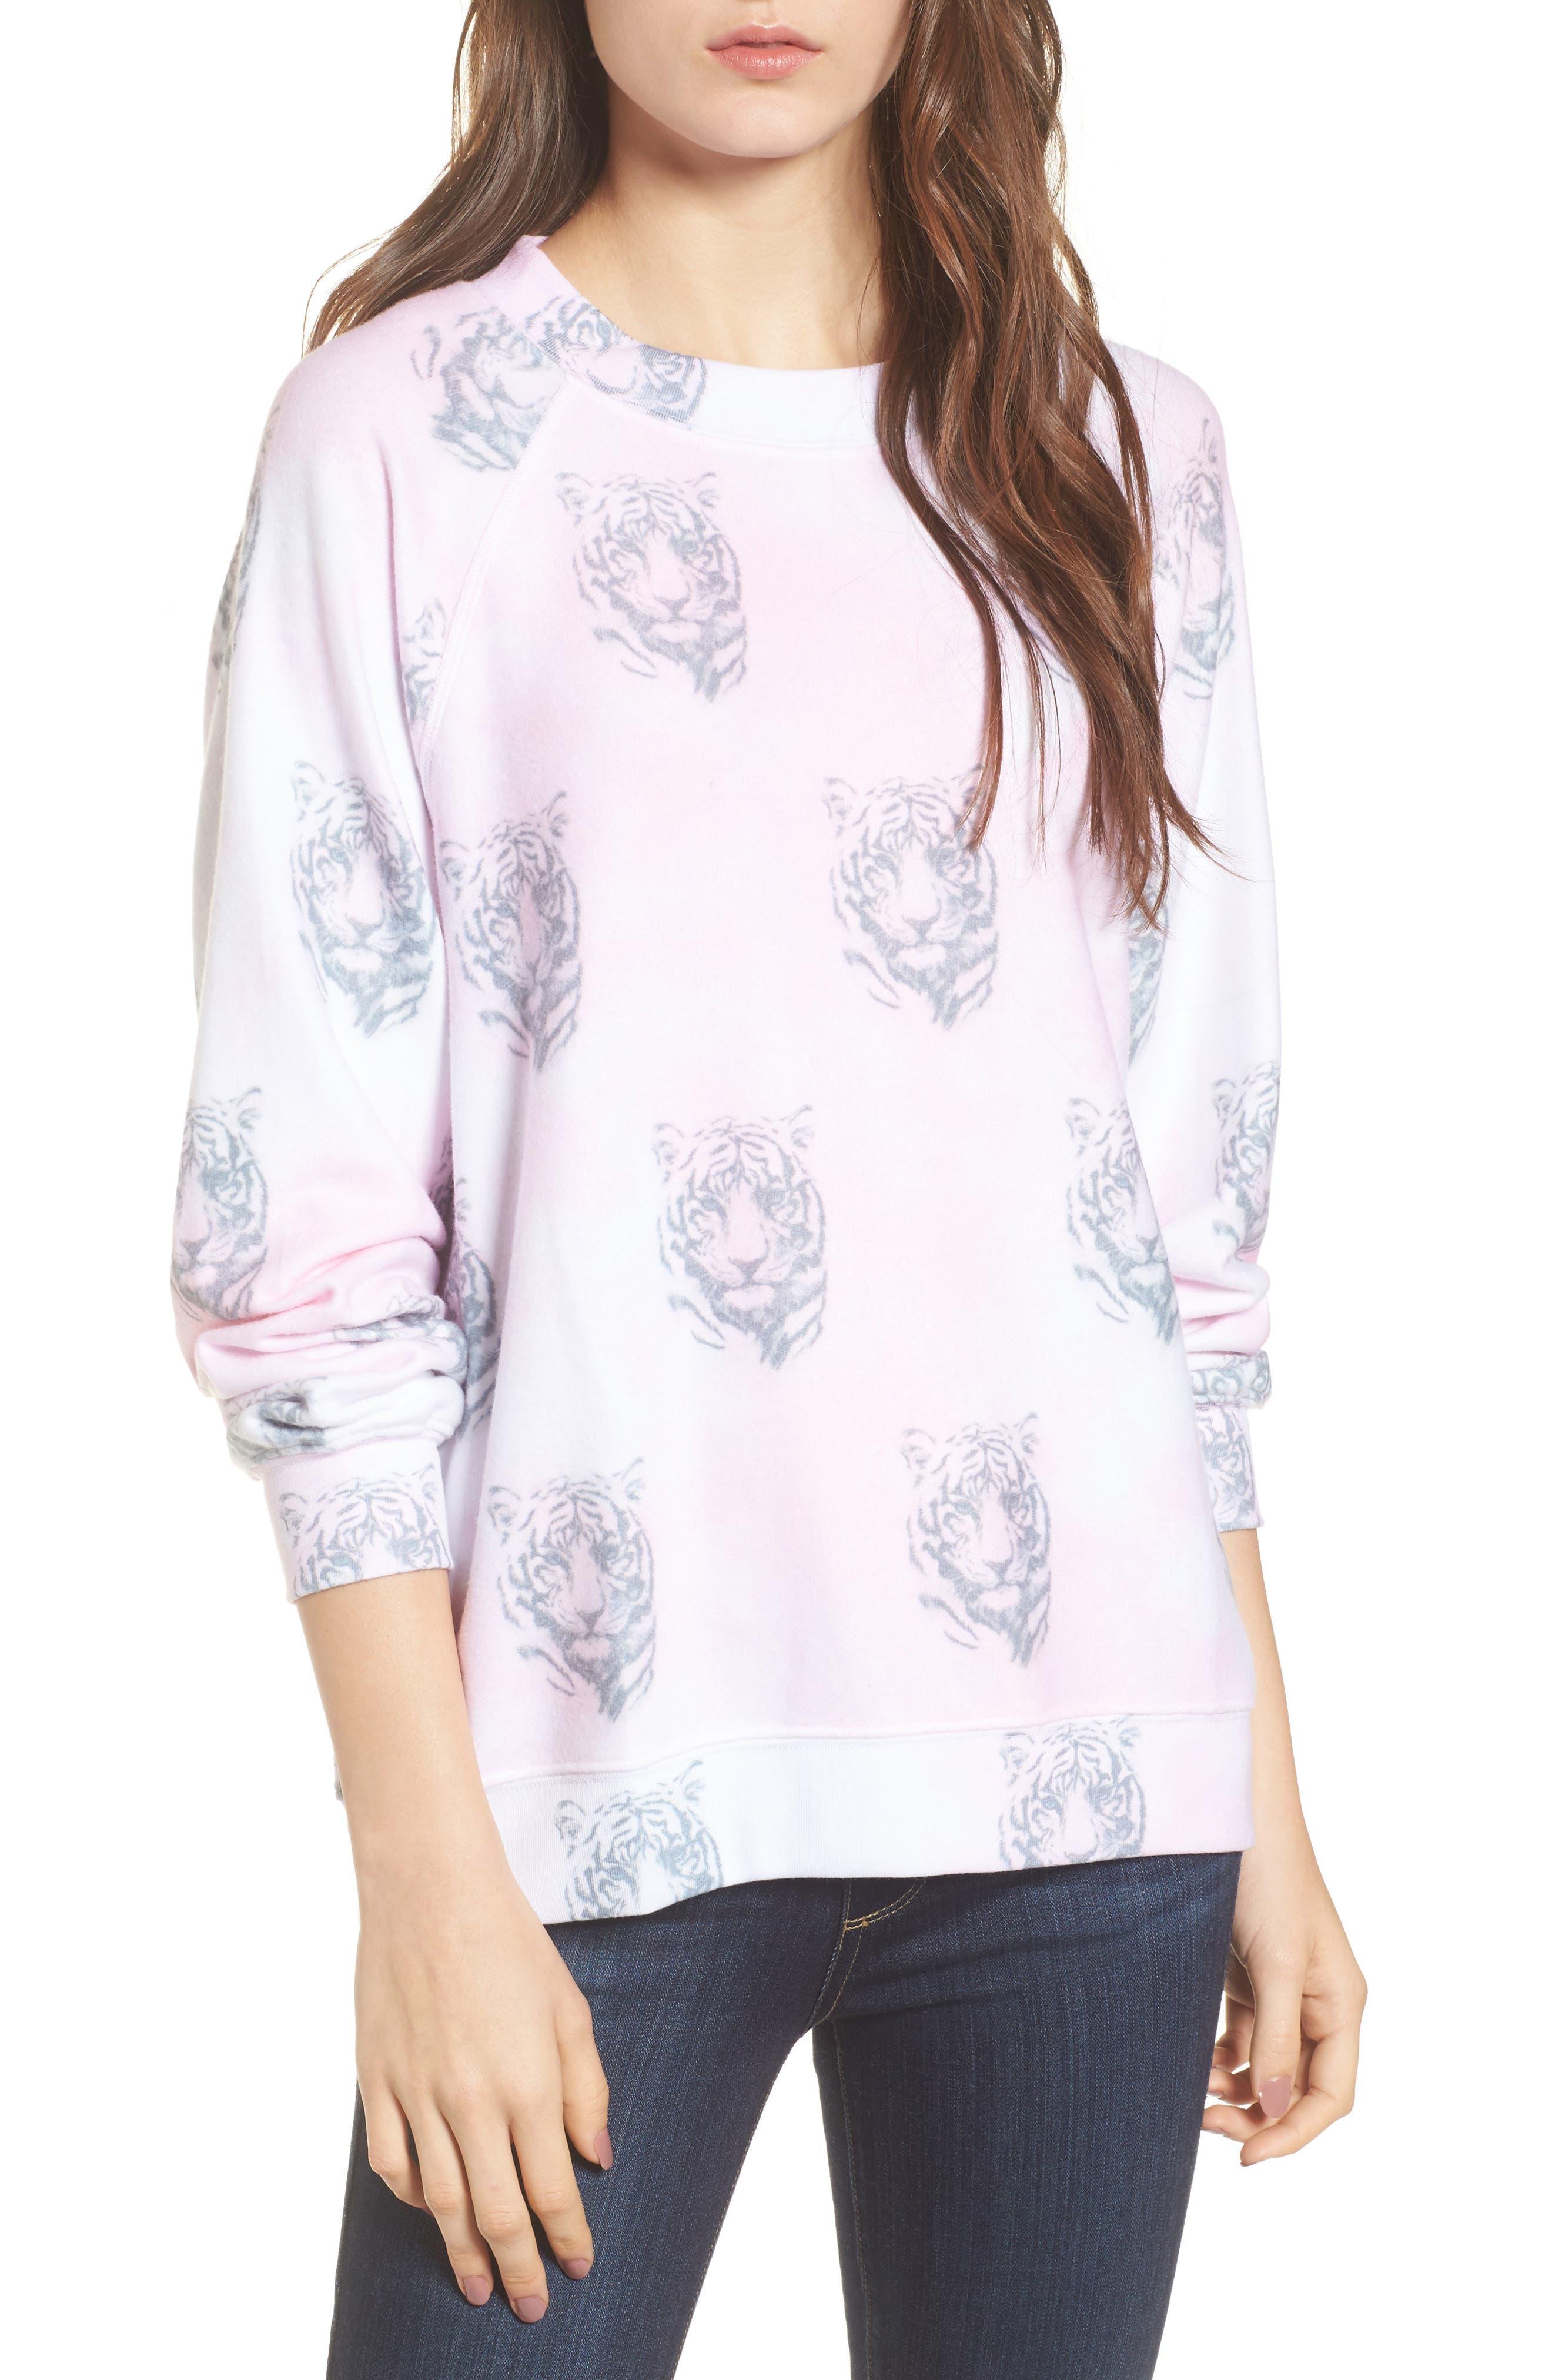 Bengals - Sommers Sweatshirt,                             Main thumbnail 1, color,                             Pink Flush